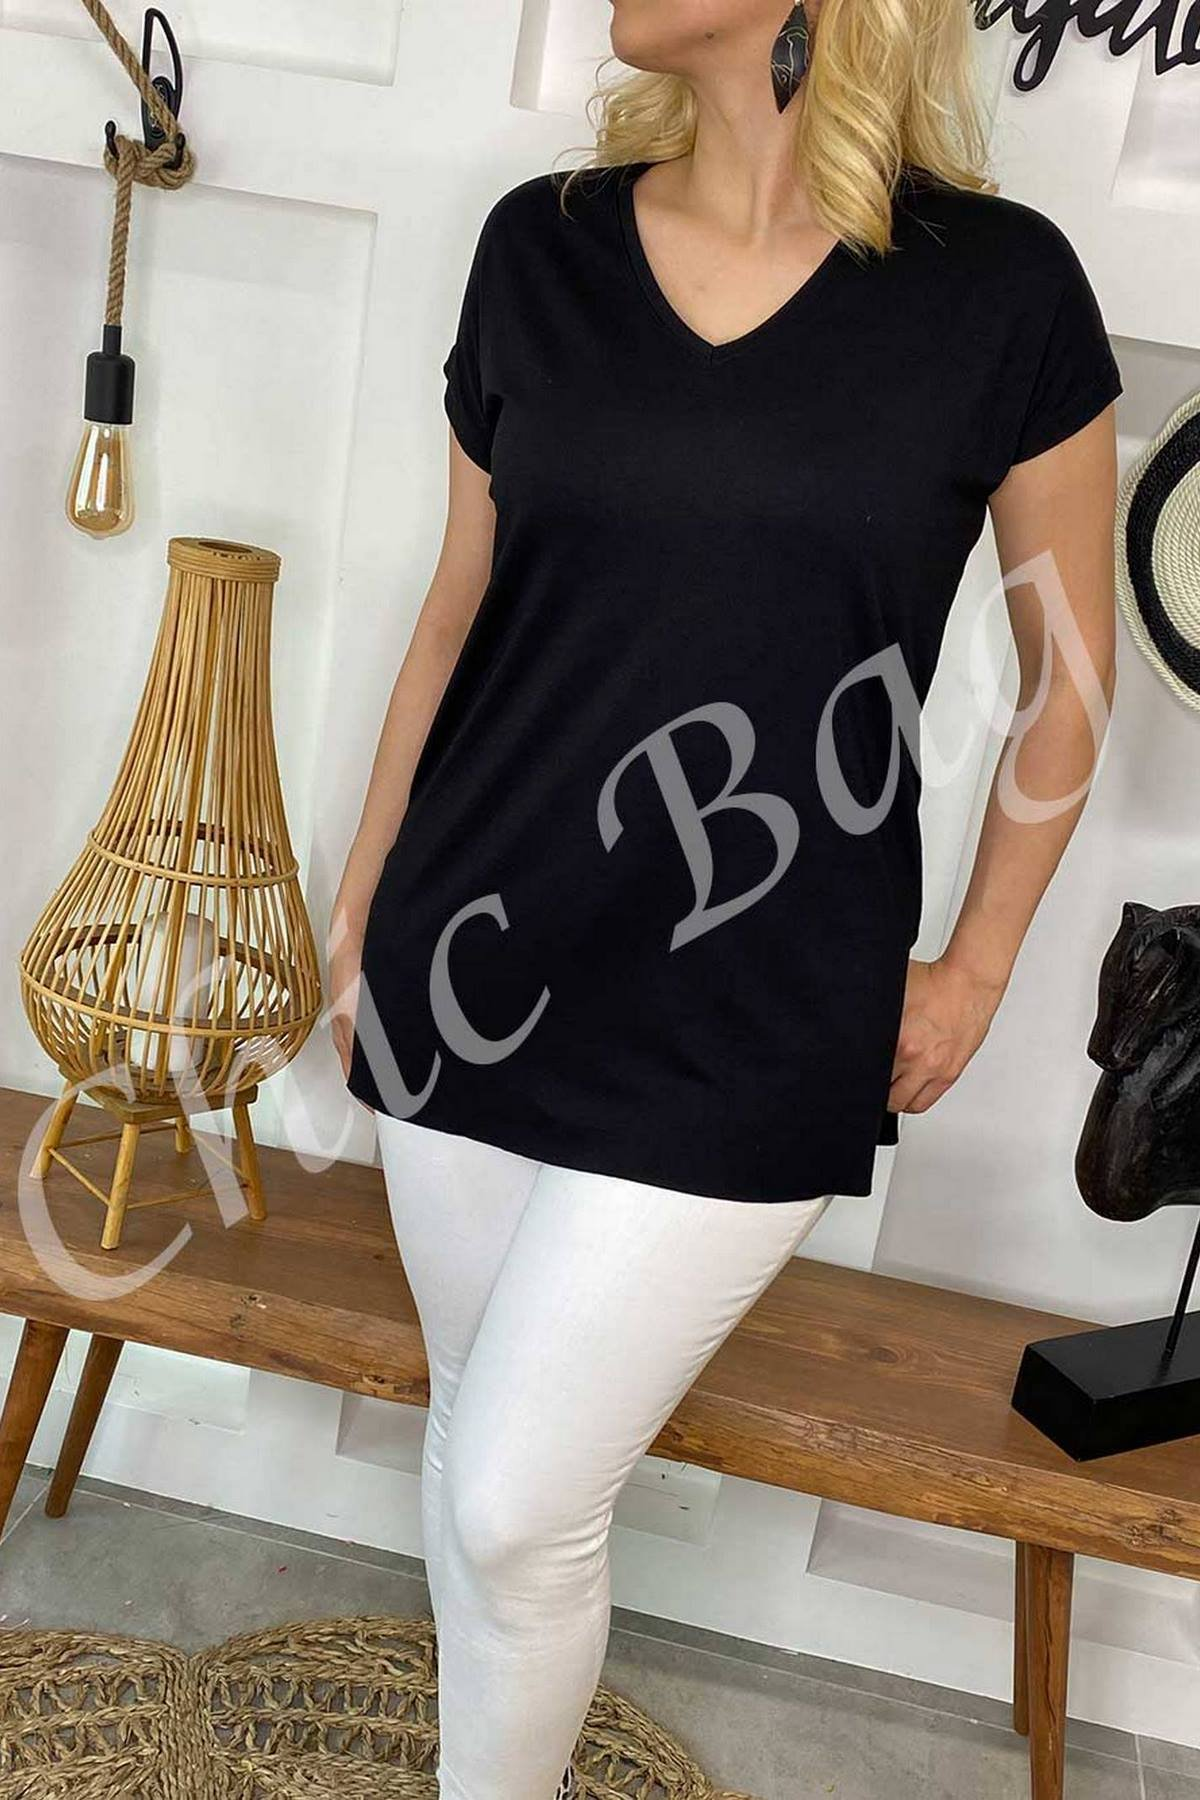 https://resim.chicbag.com.tr/p000879/shy/v-yaka-etegi-kesik-ve-yirtmacli-t-shirt-thscrt-01e46e348f0b.